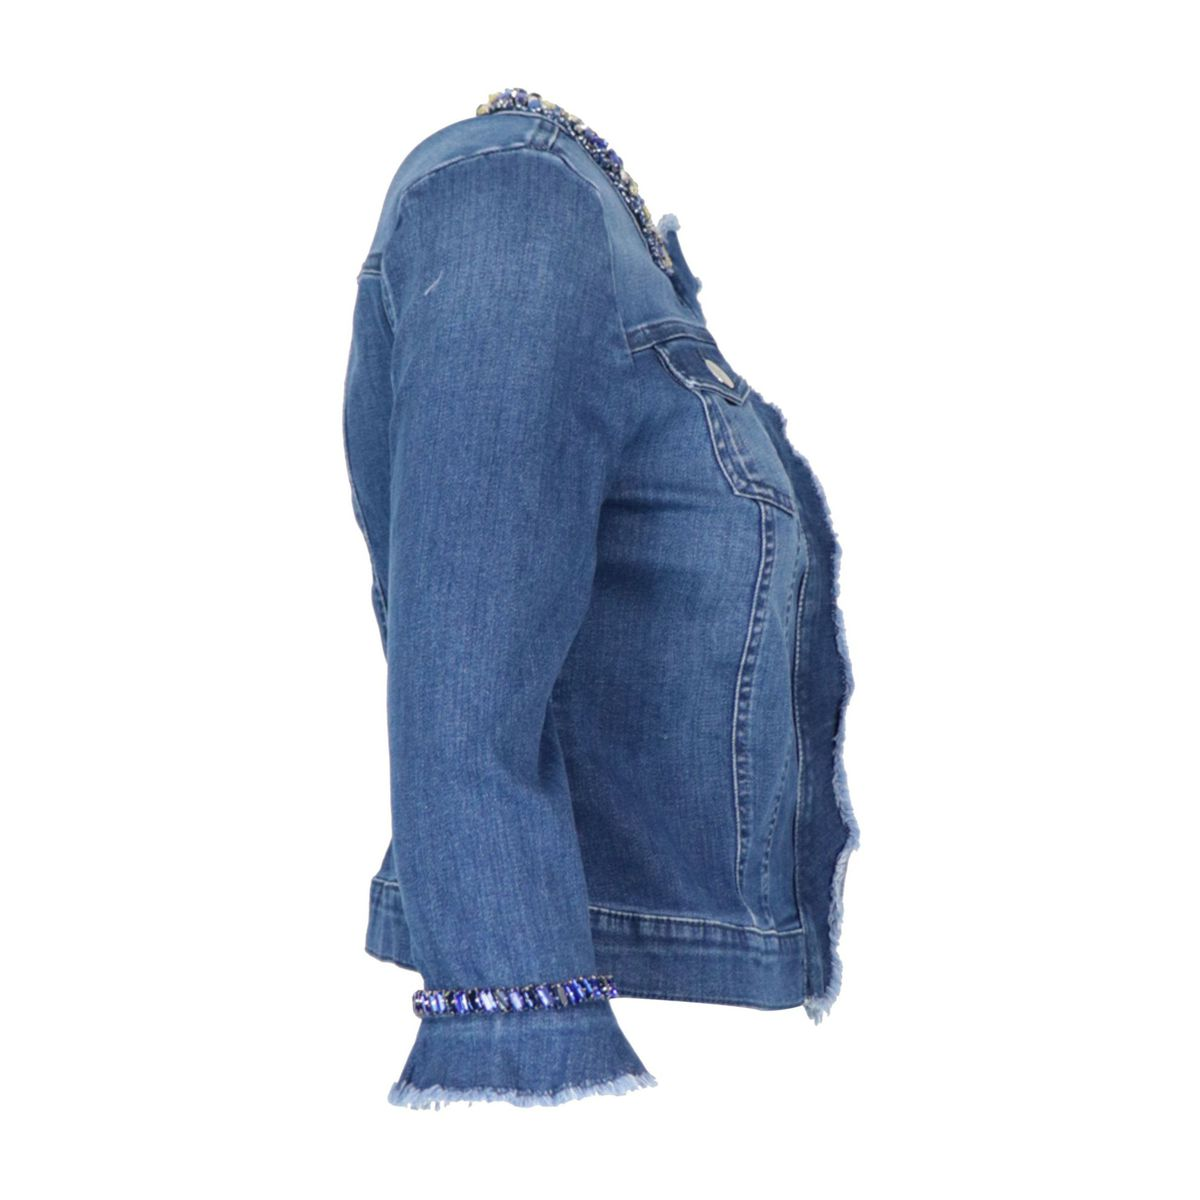 Sienna stretch denim jacket with jewel applications Dark denim Nenette